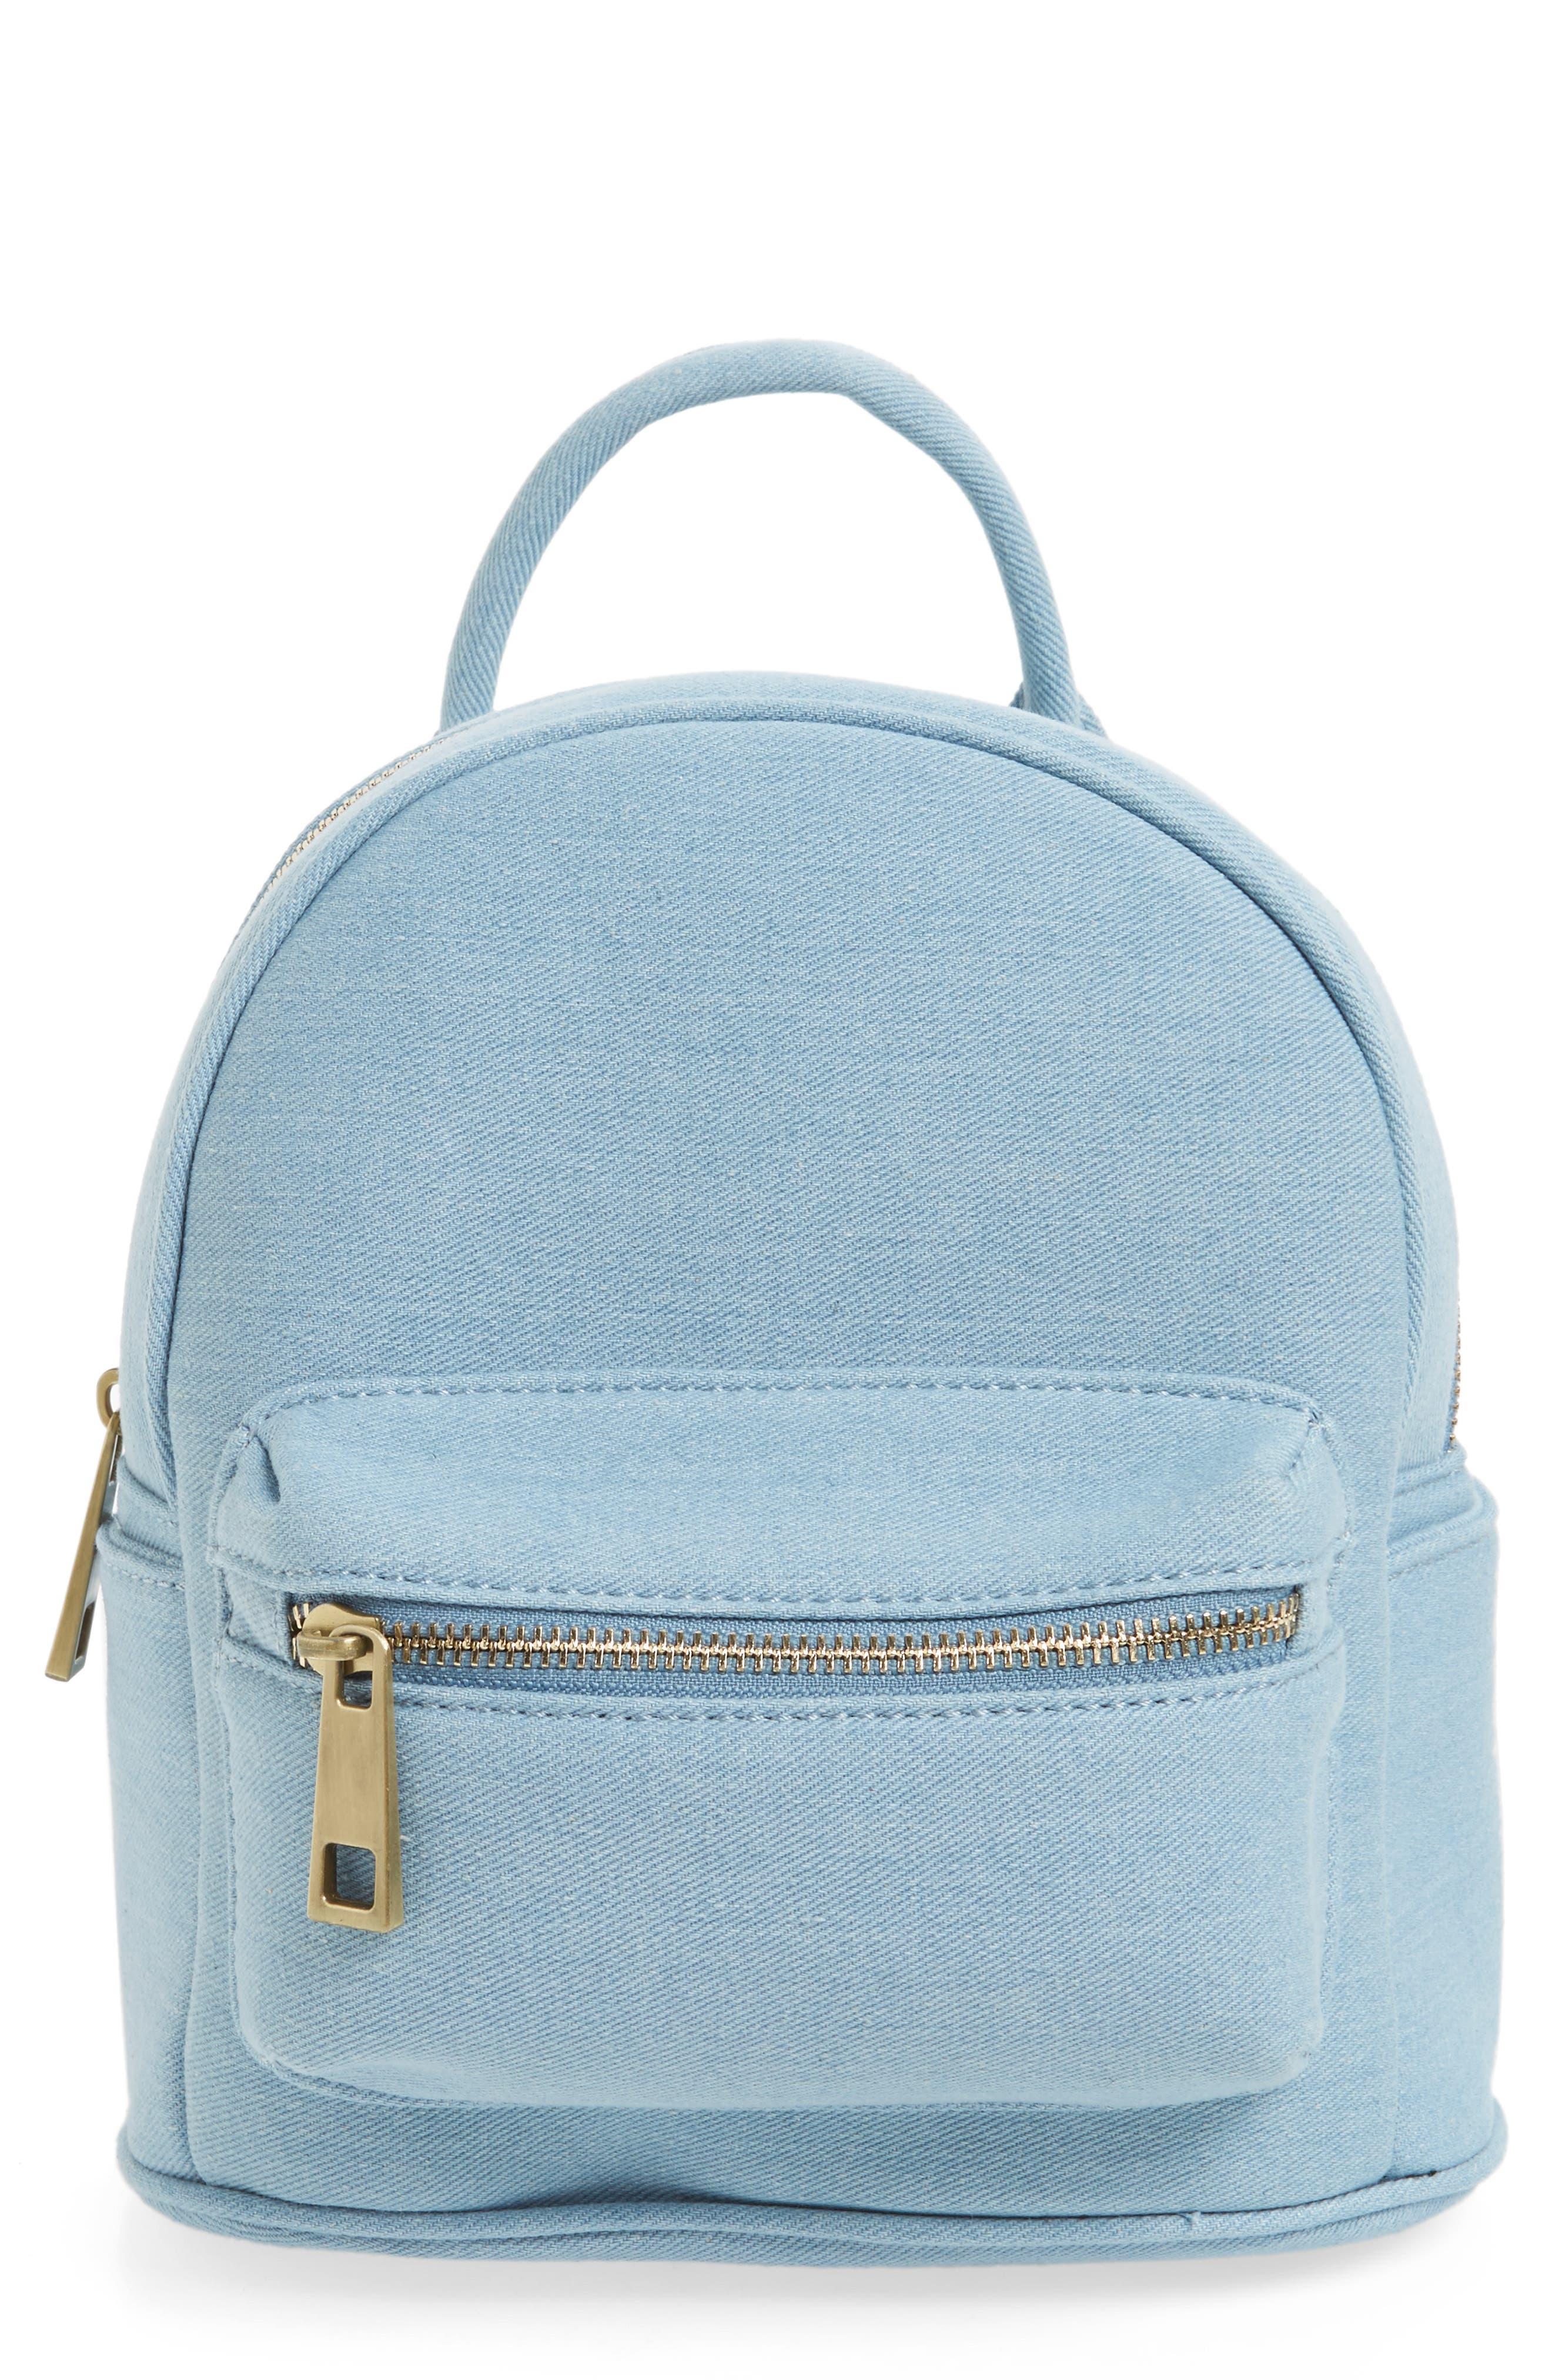 Main Image - Street Level Mini Backpack